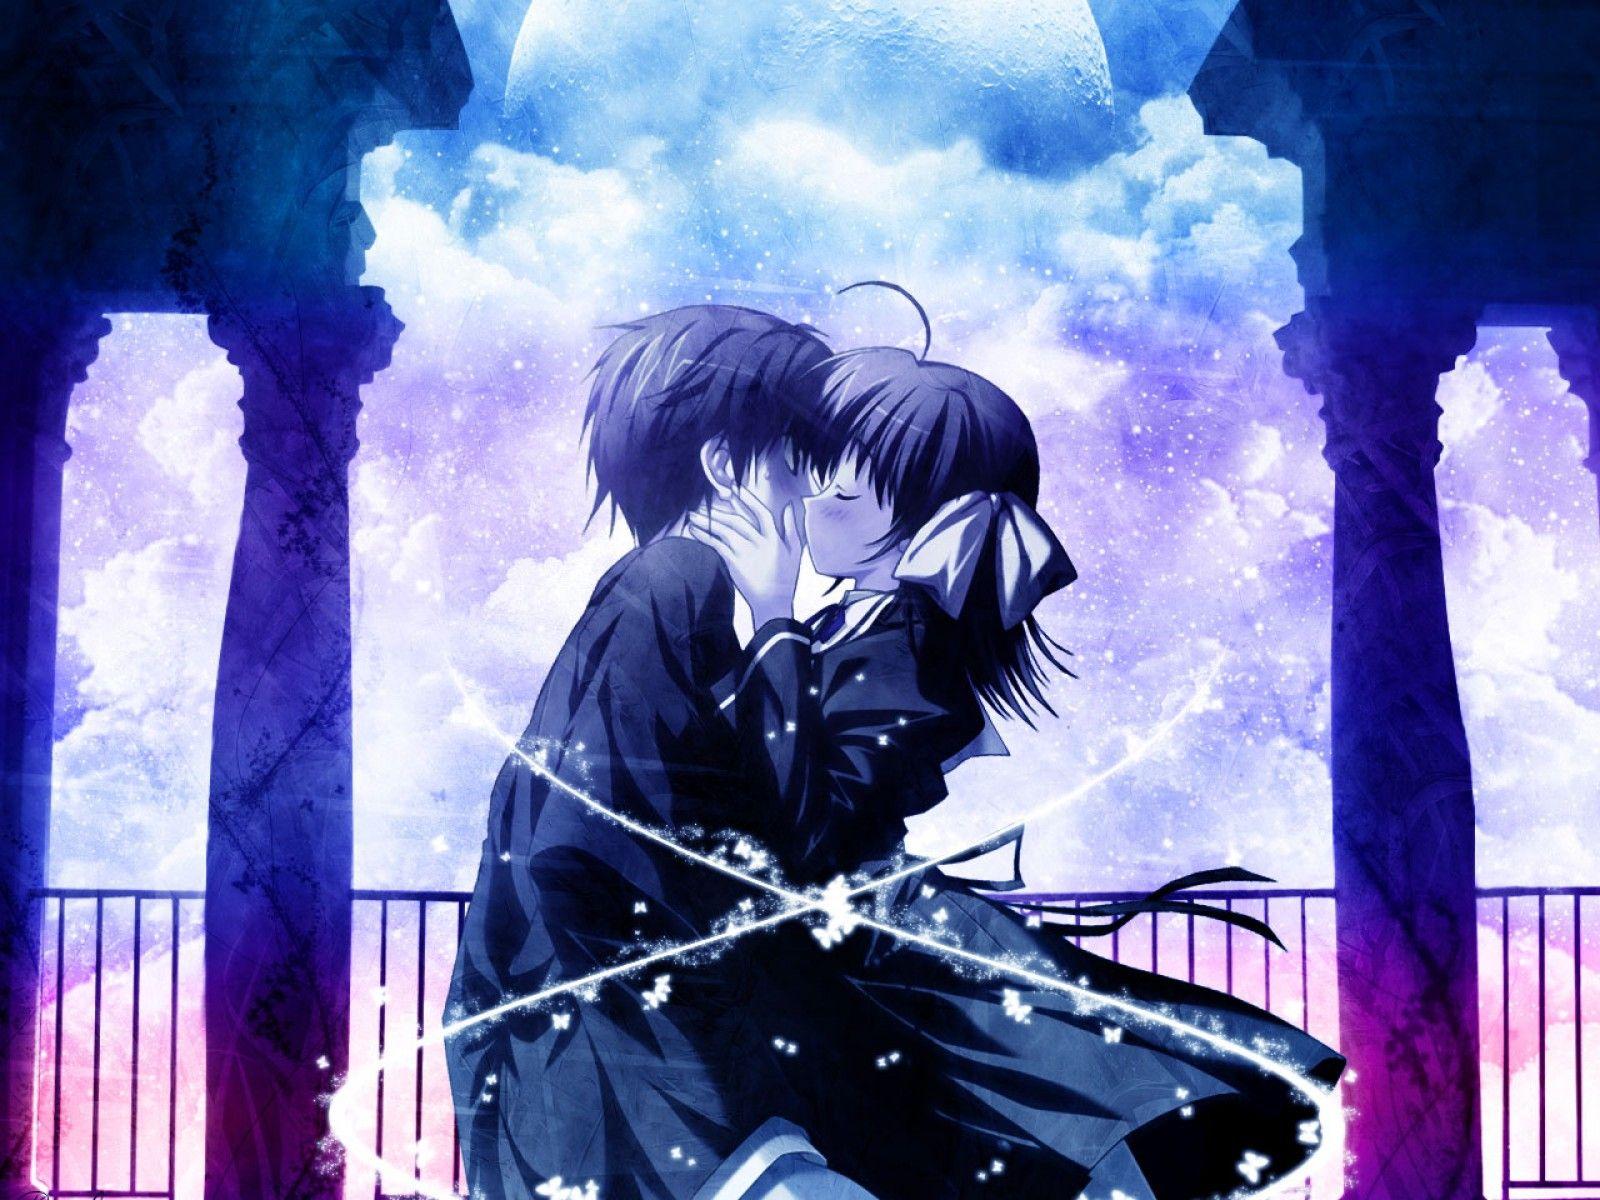 Anime Love Romantic Anime Anime Wallpaper Awesome Anime